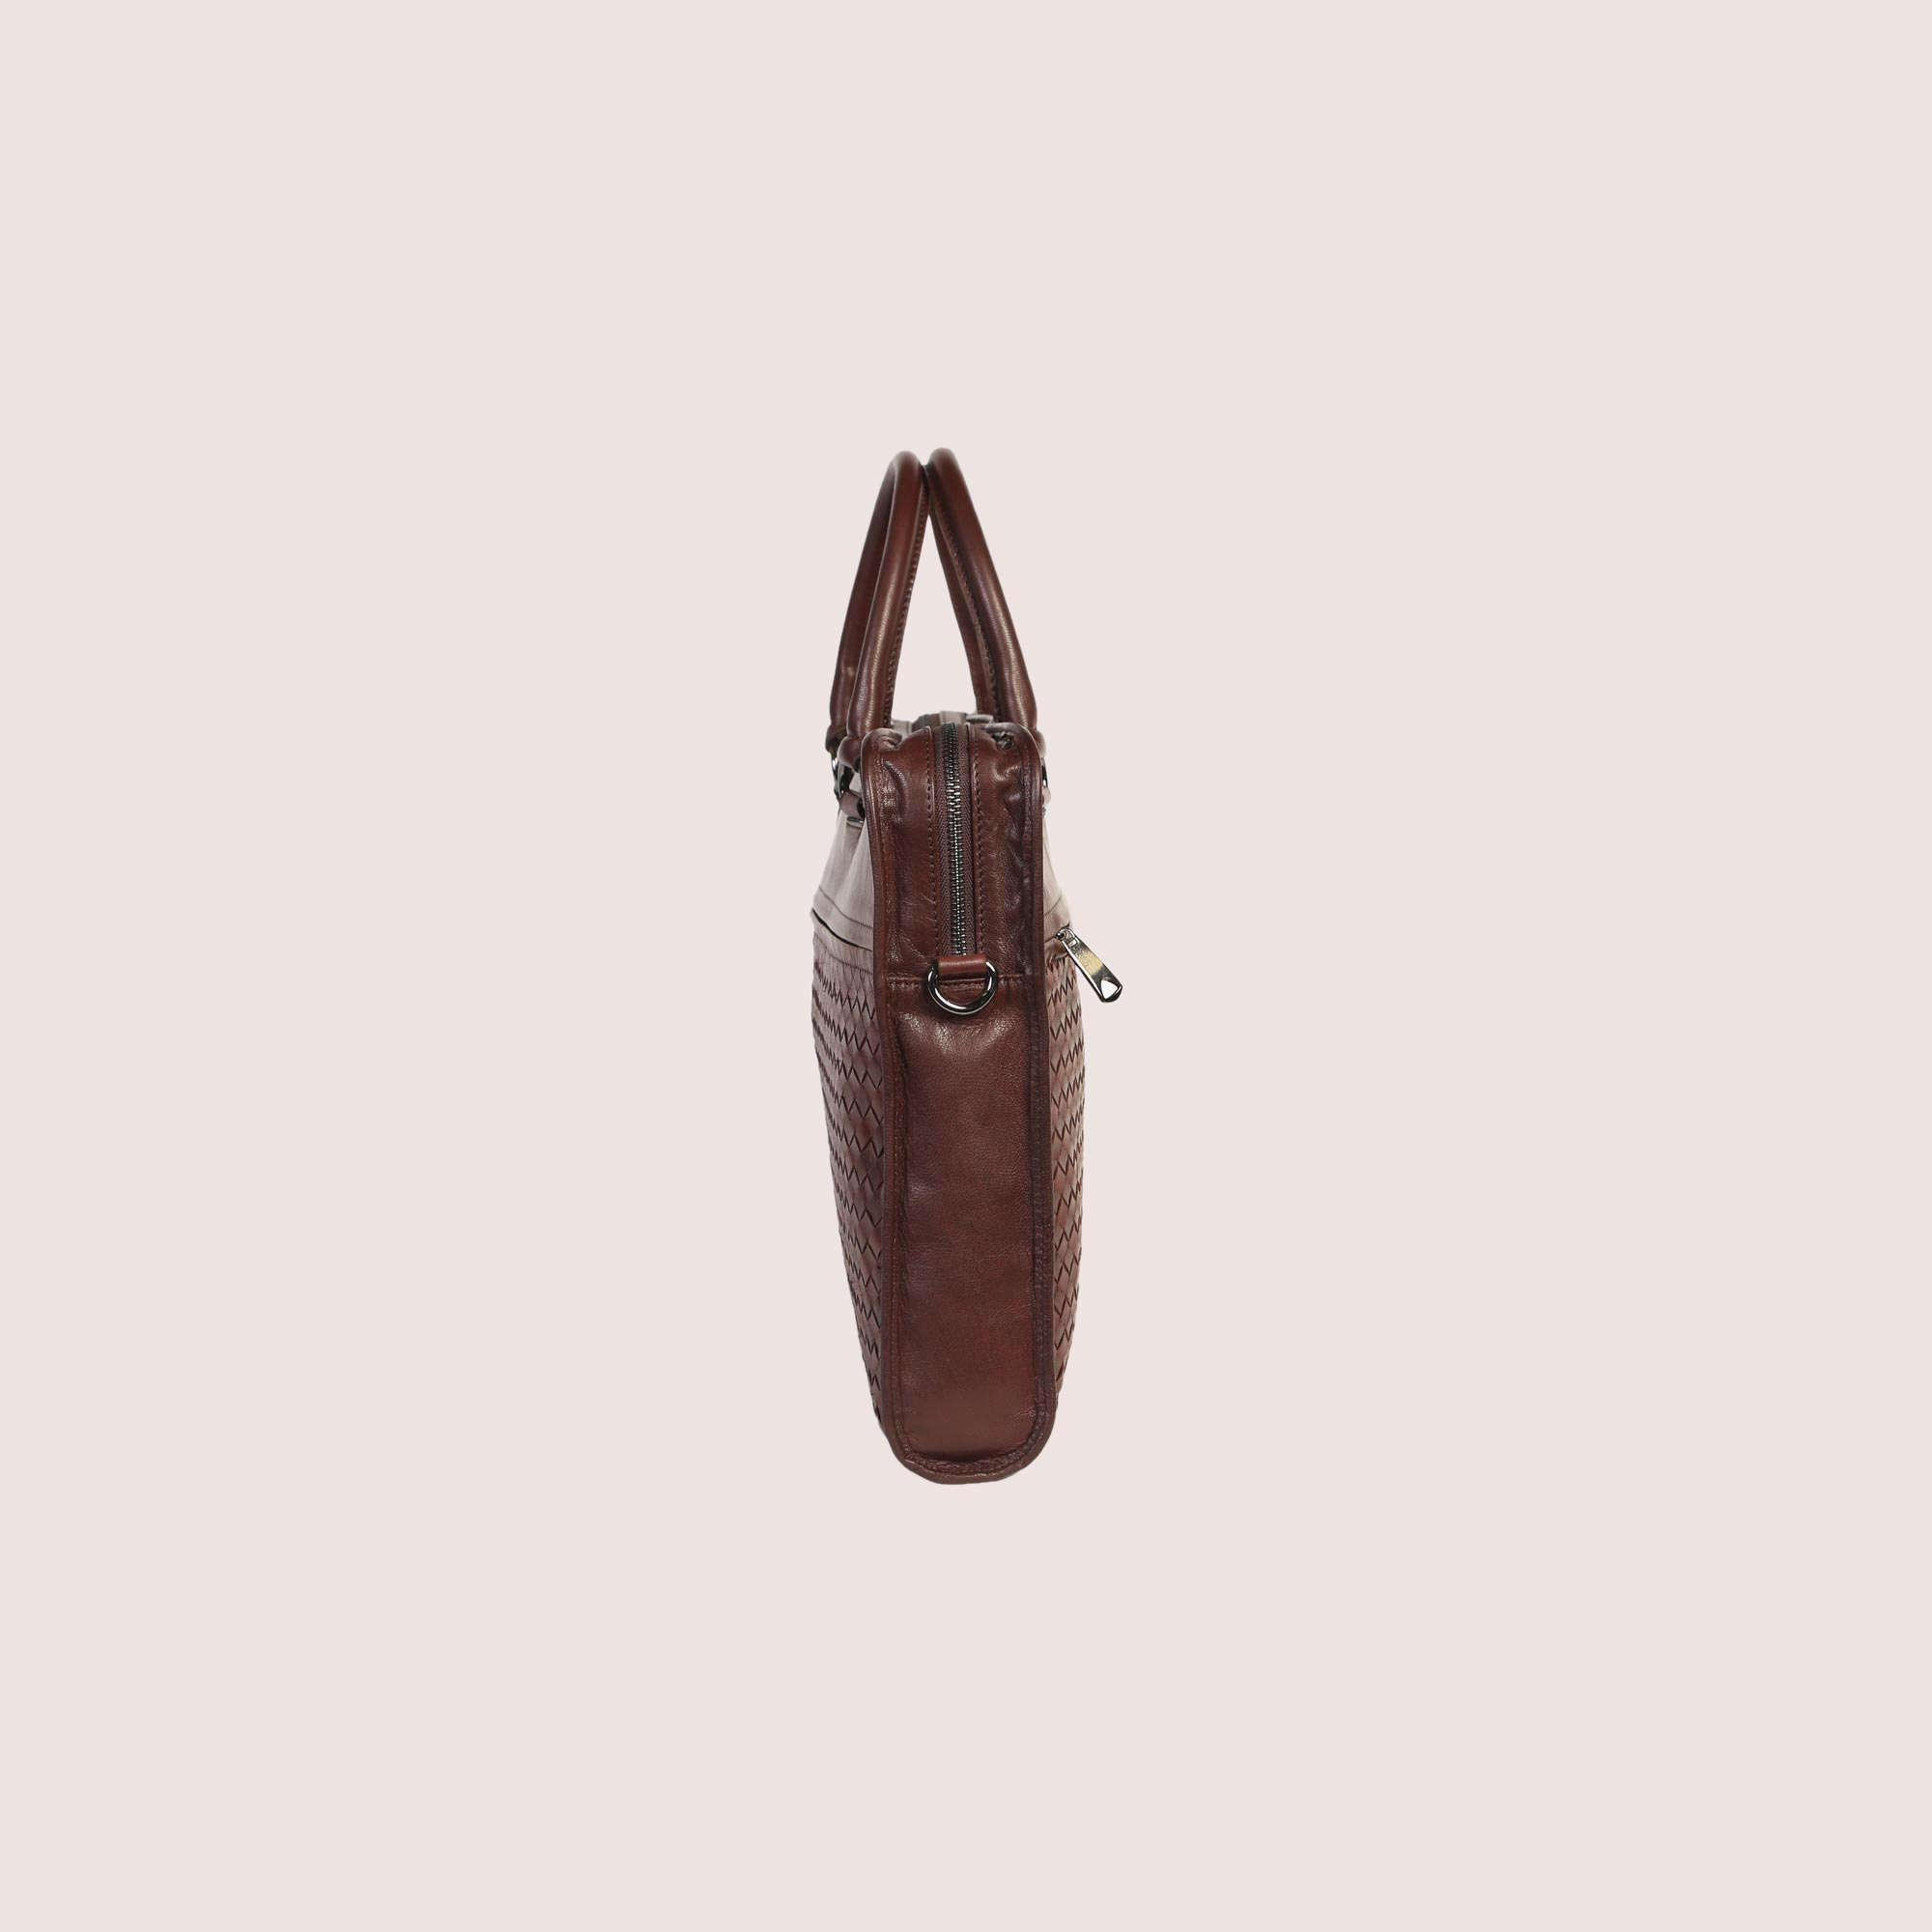 Anderson Hand Woven Briefcase